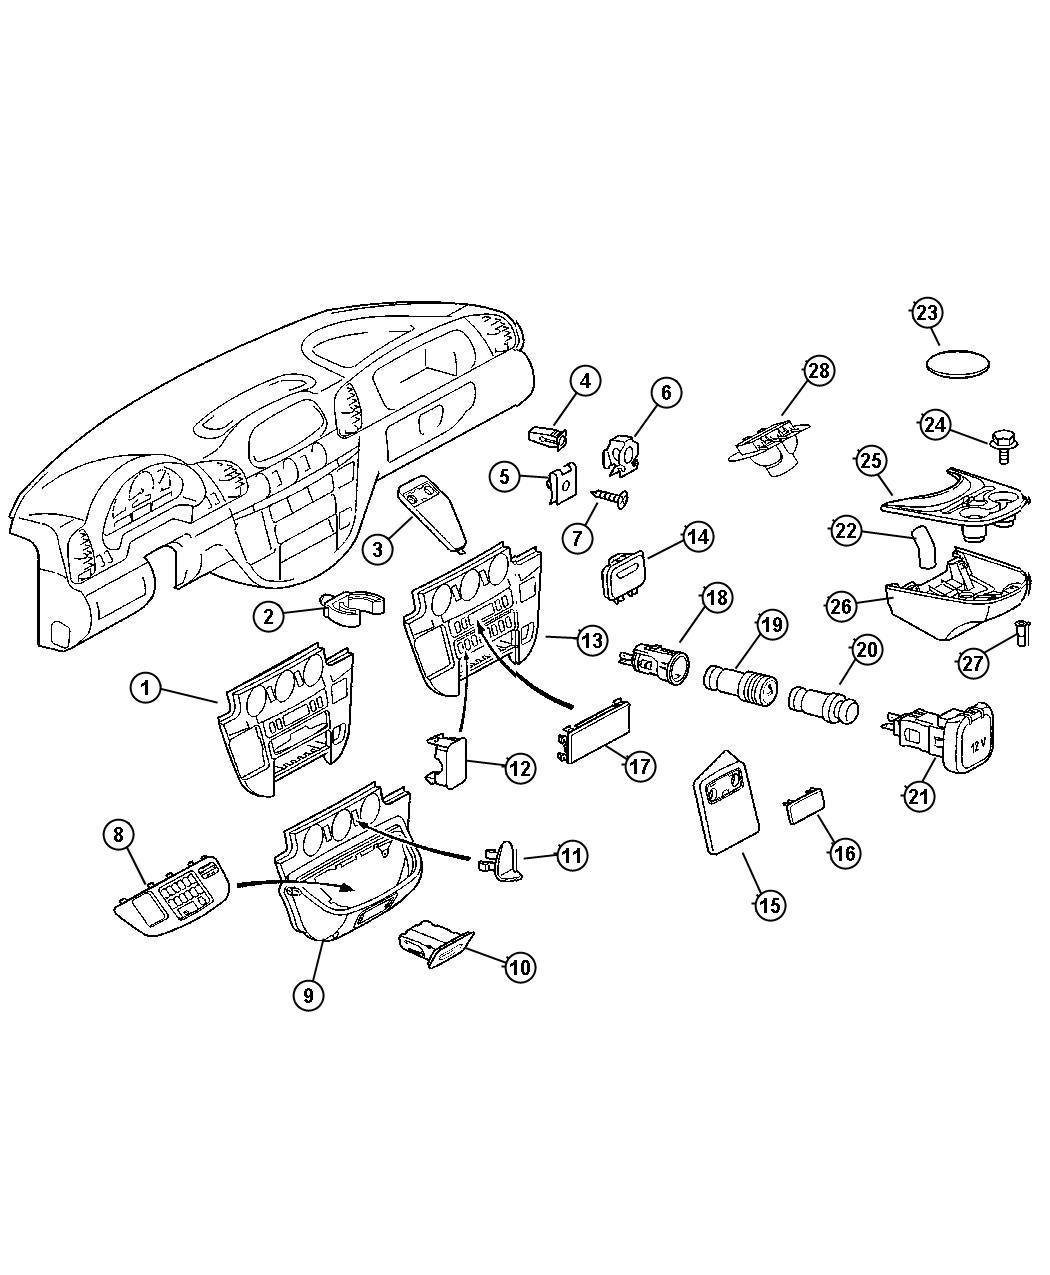 2003 Dodge SPRINTER 3500 Cover. Instrument panel. Paper